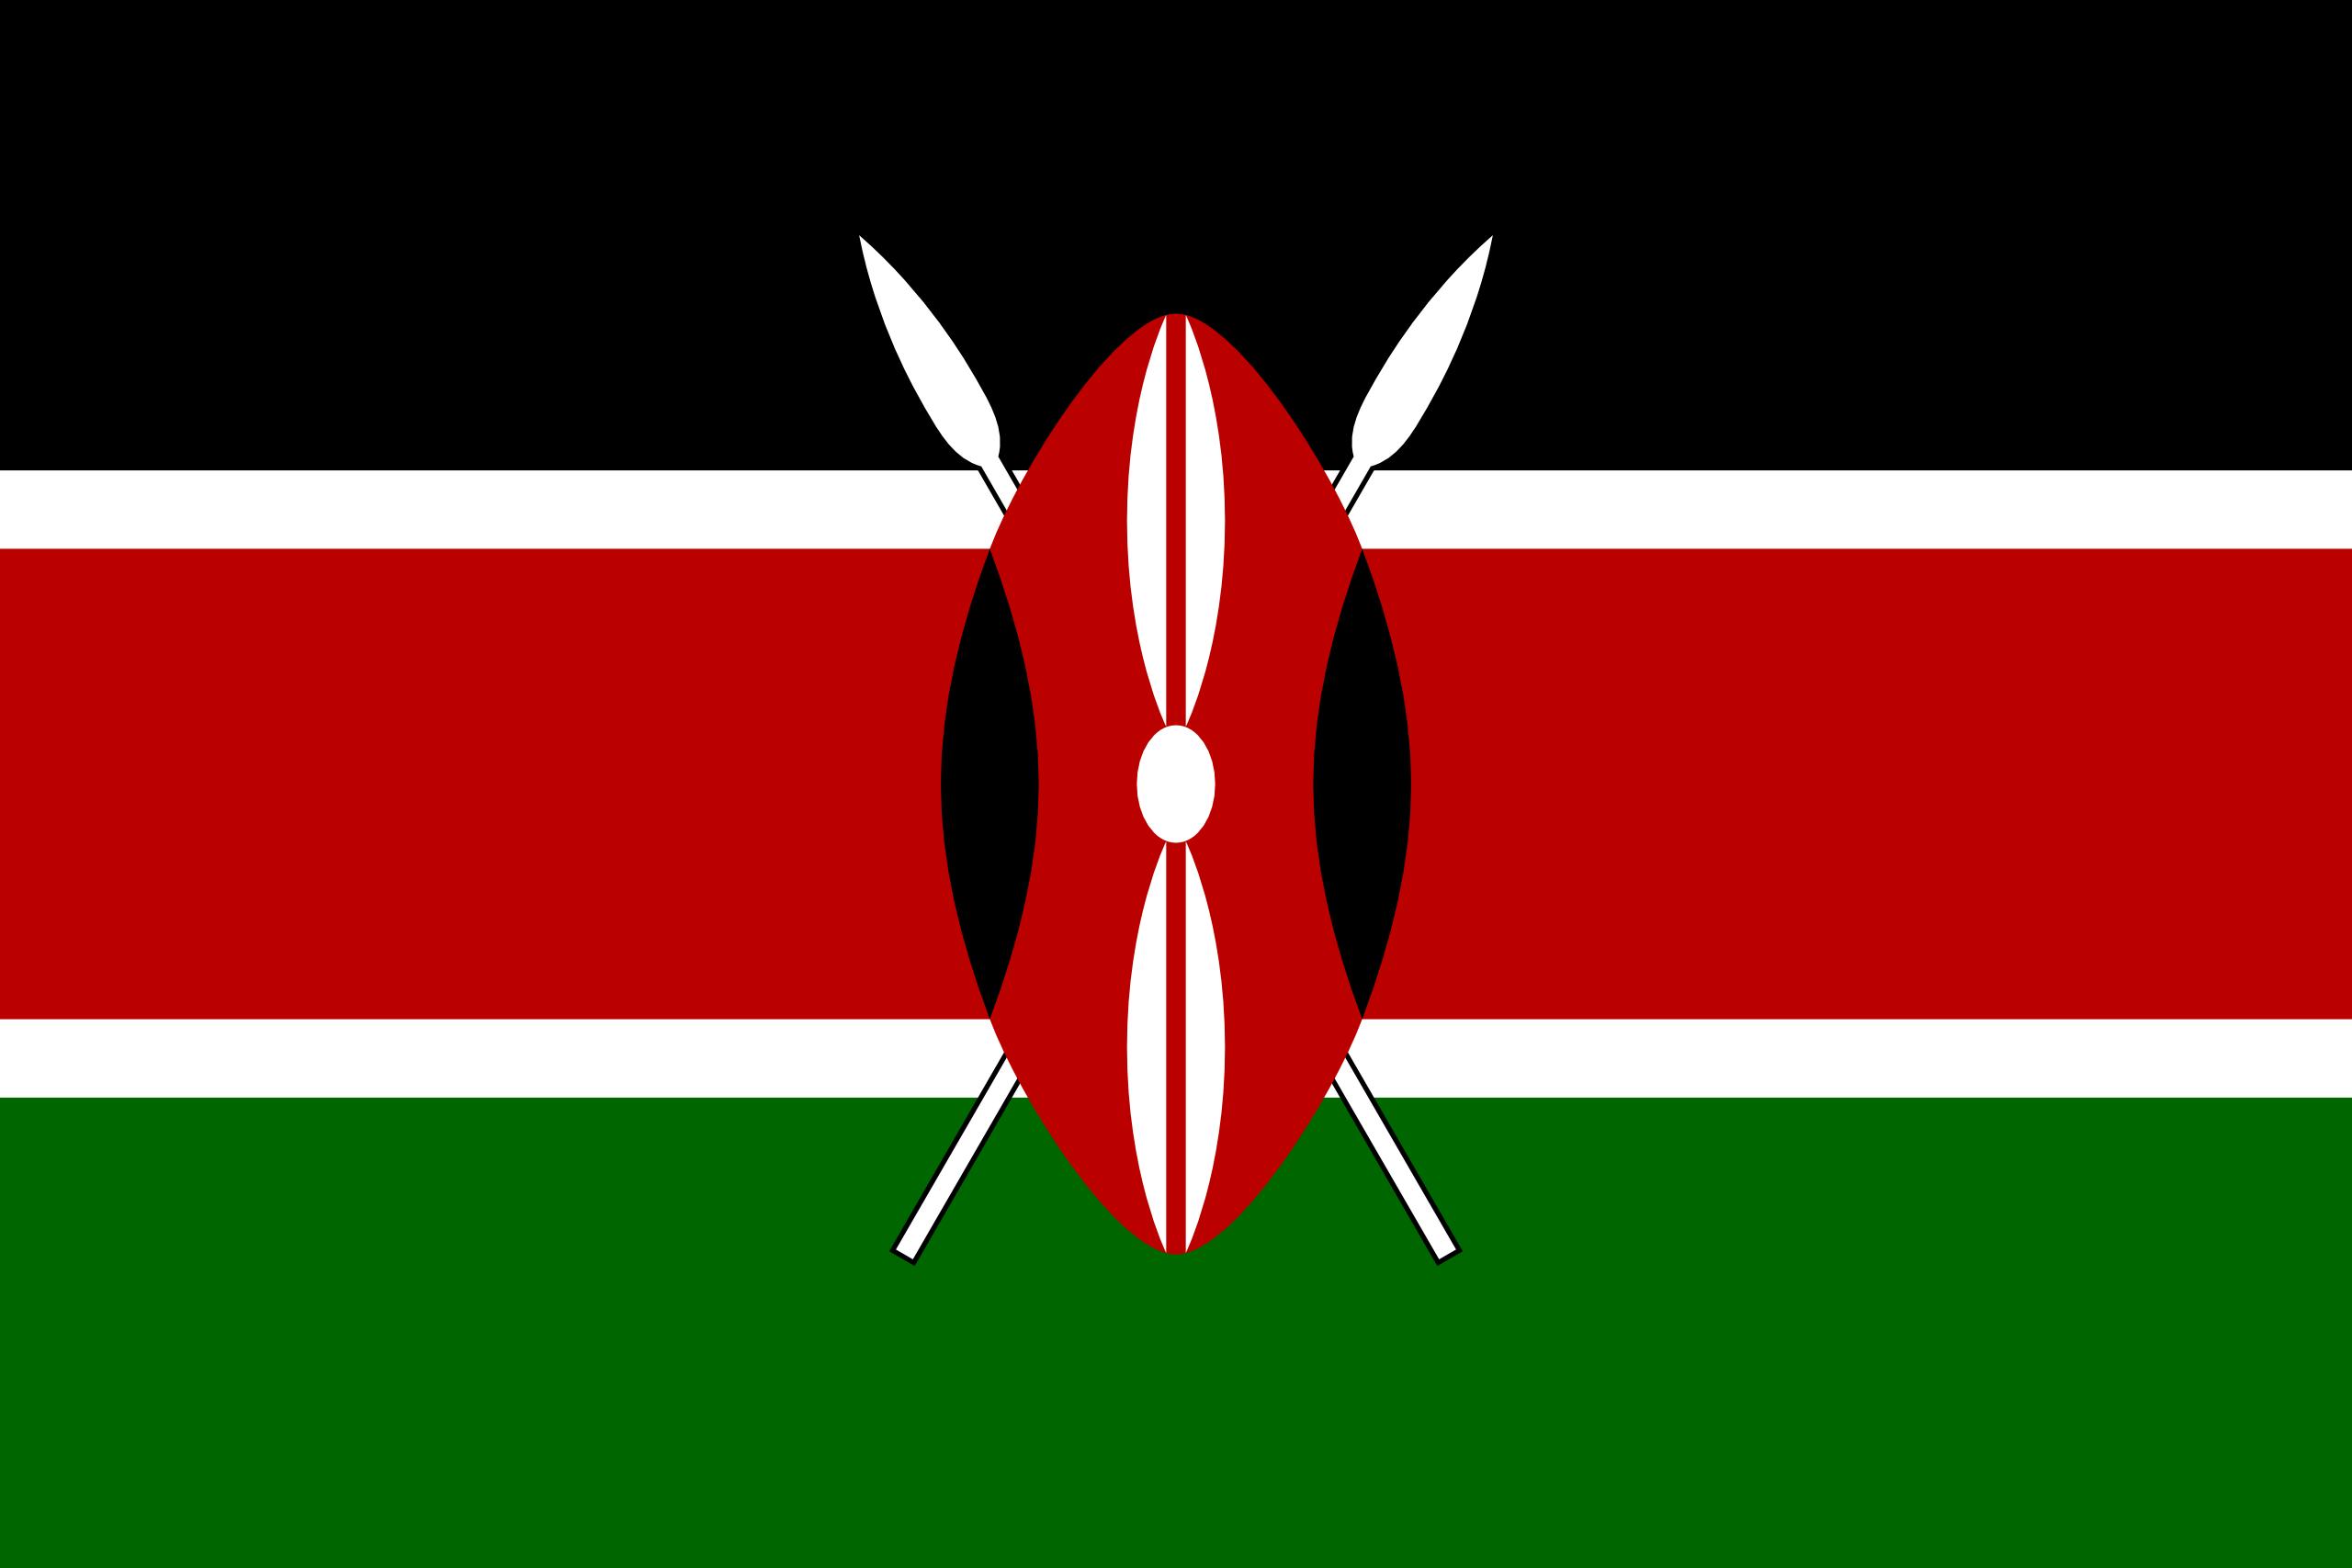 kenia, paese, emblema, logo, simbolo - Sfondi HD - Professor-falken.com